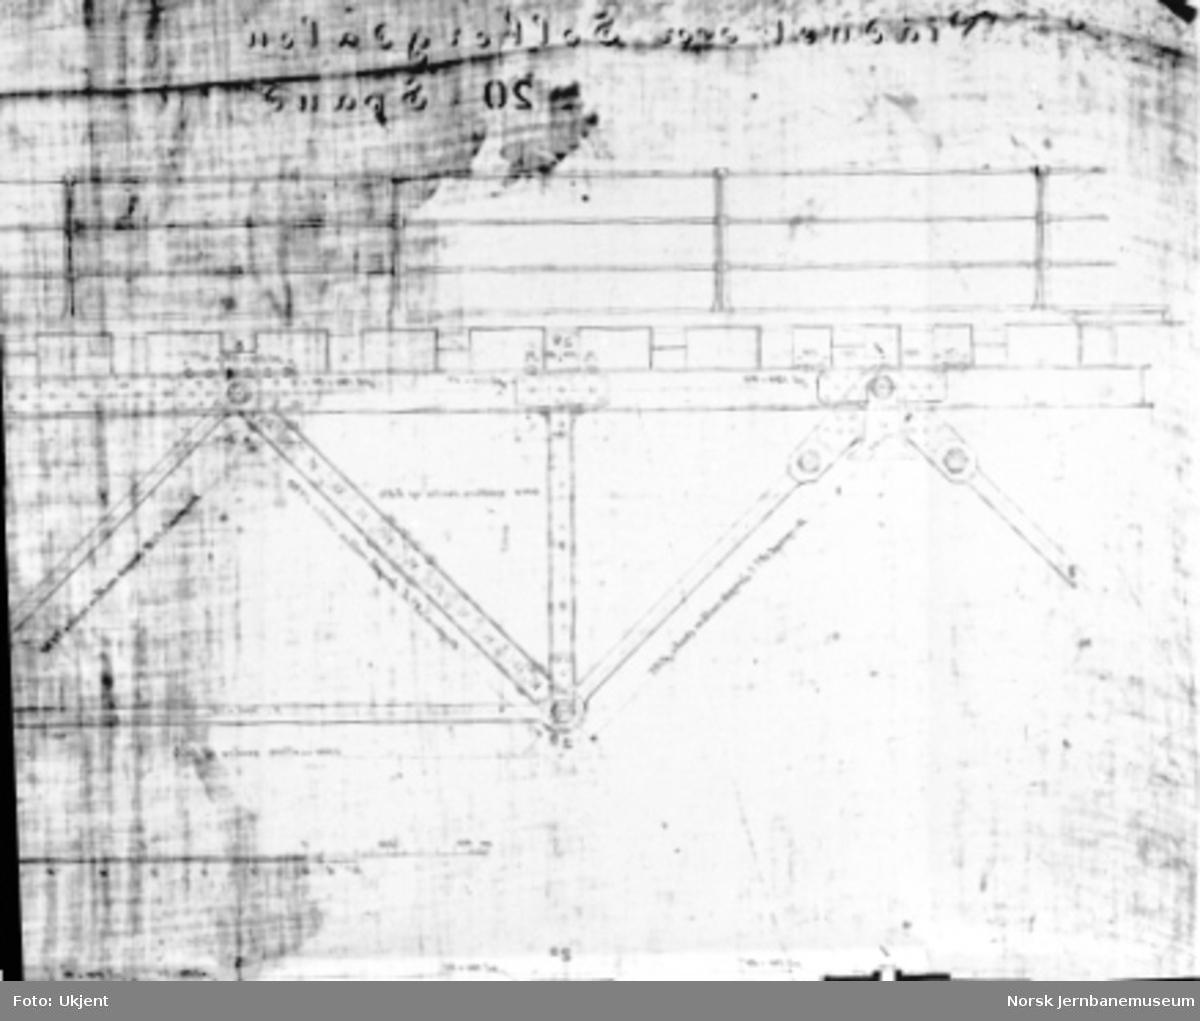 Tegning av Solberg viadukt, detaljer